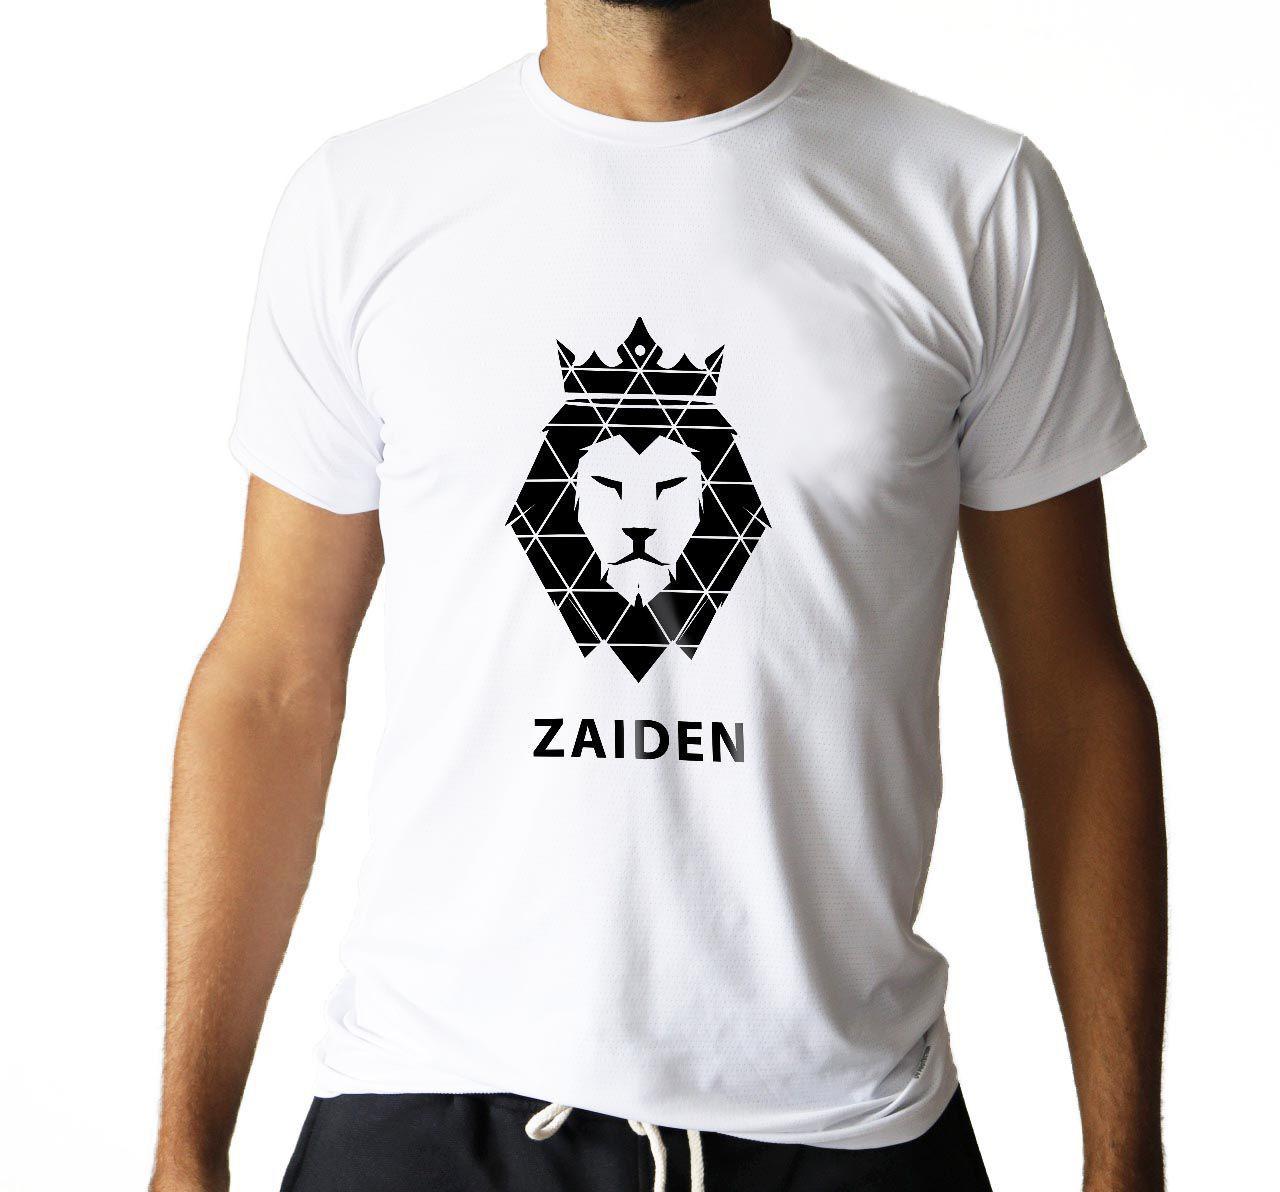 Camiseta Masculina Poliamida Branca ZAIDEN Leão Preto